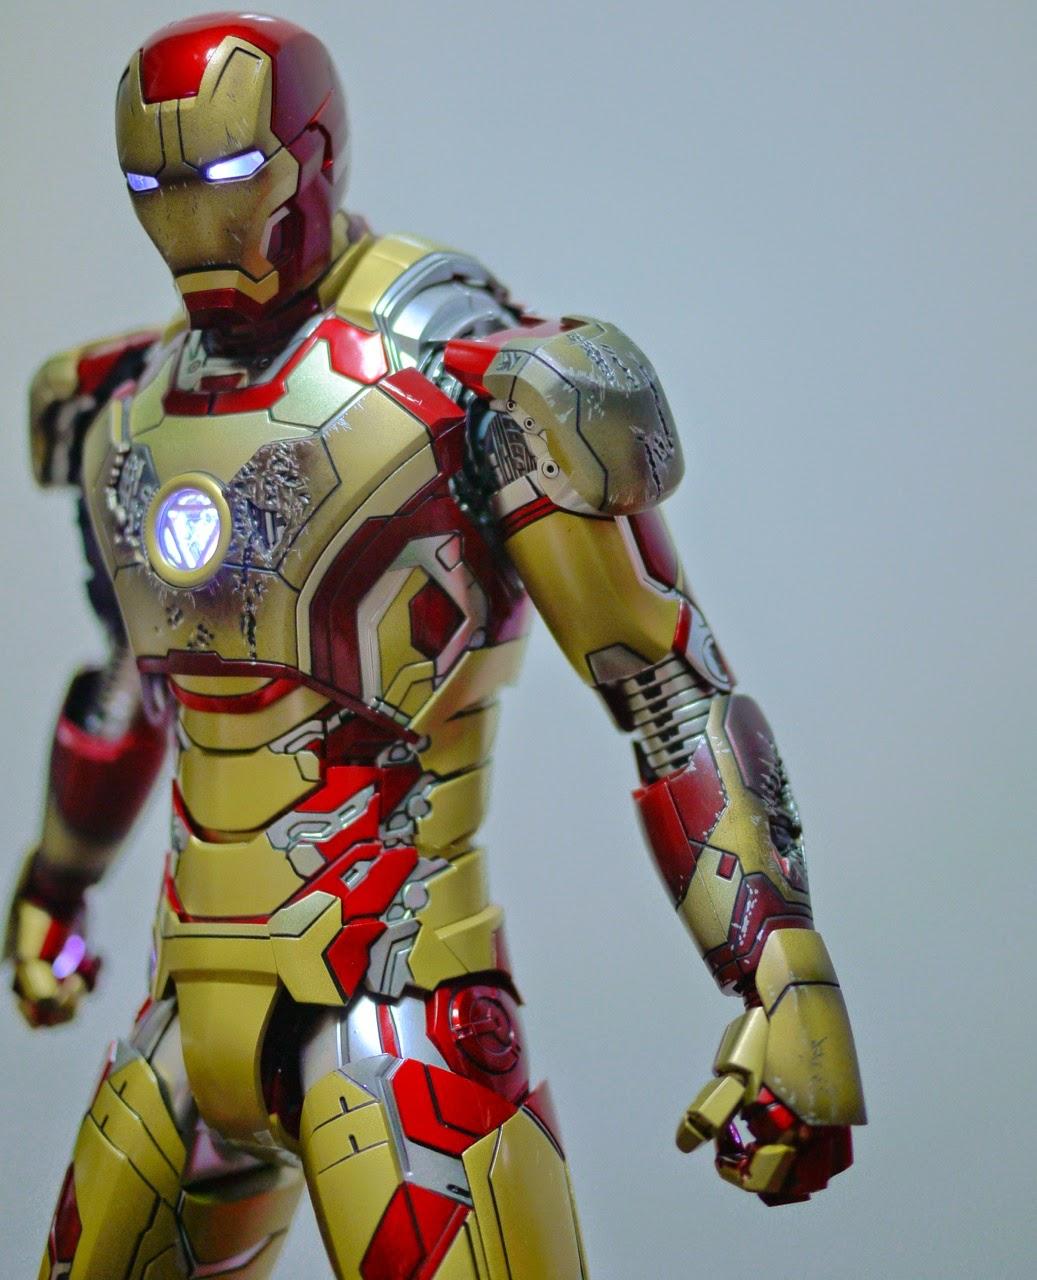 Marvel Iron Man Marvel Legends Iron Man Mark 42 Figure 6